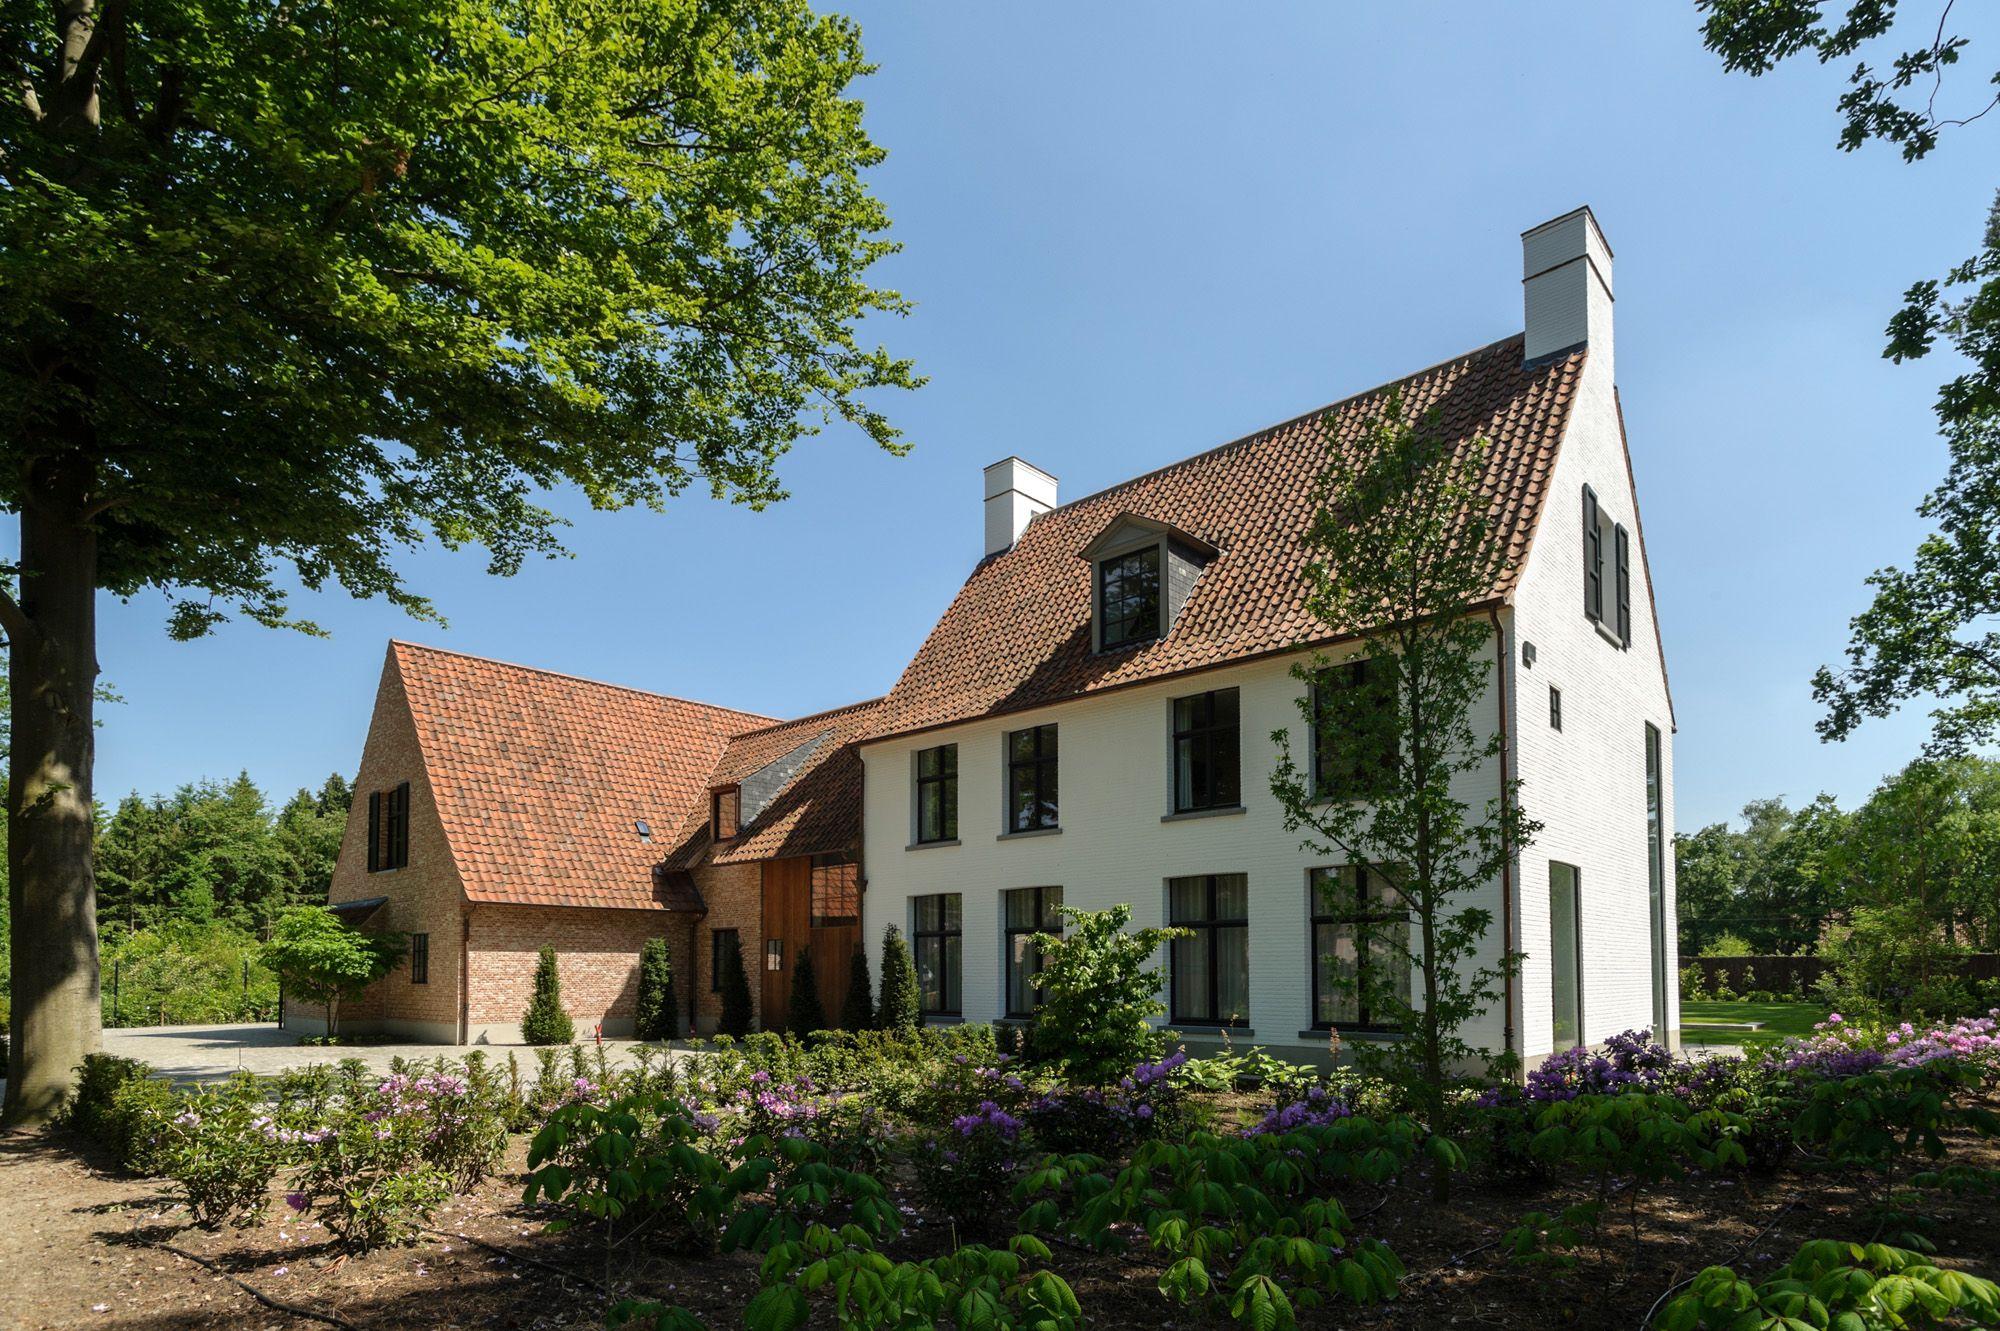 Vlassak architects architect pieter vlassak tijdloos hedendaags wonen villabouw renovatie - Architectuur renovatie ...